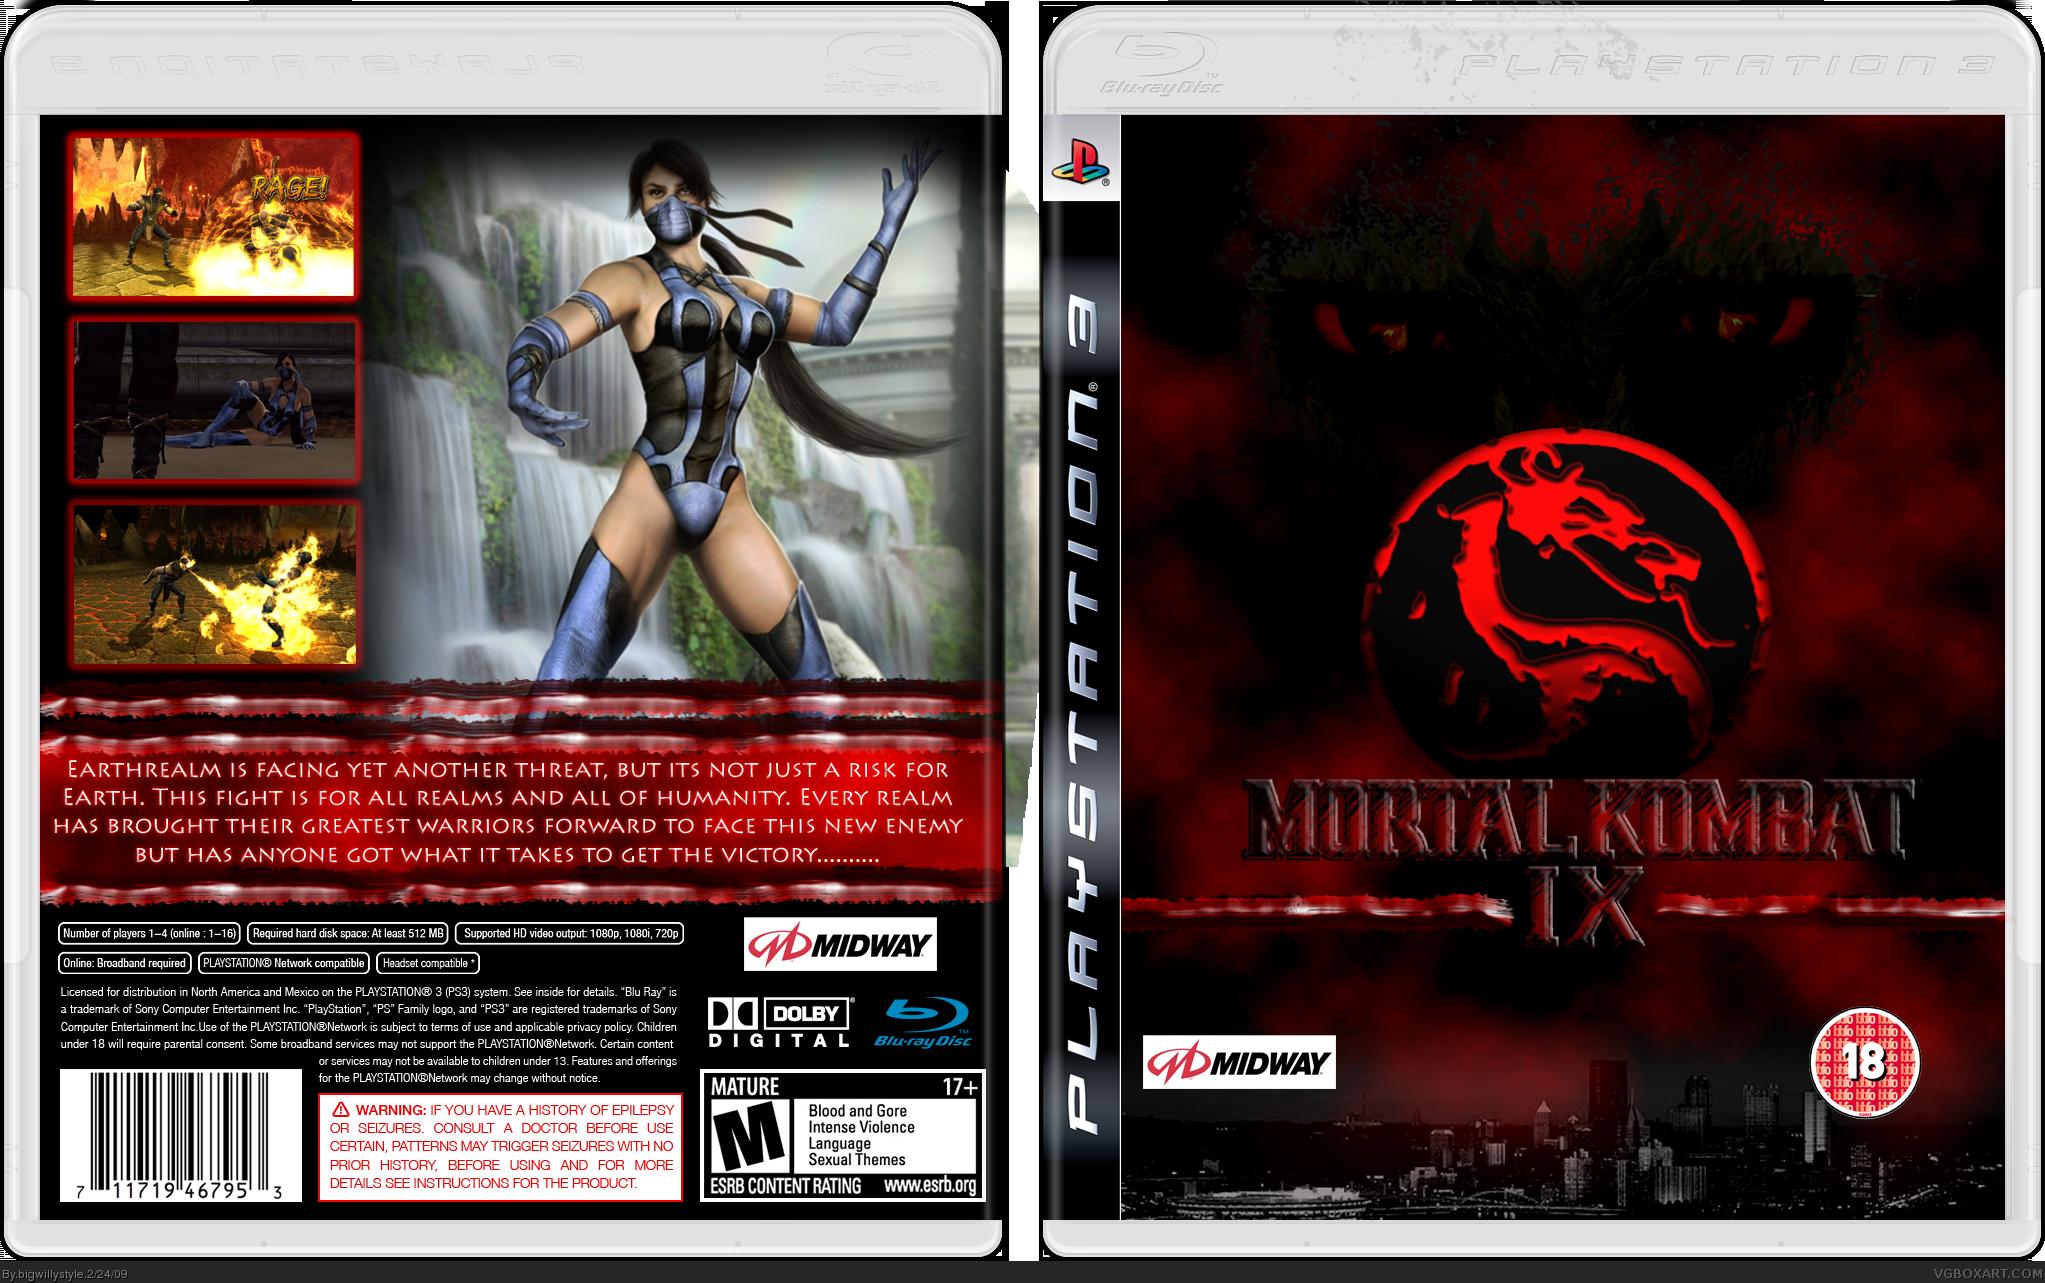 Original Xbox Logo Mortal Kombat 9 PlaySt...